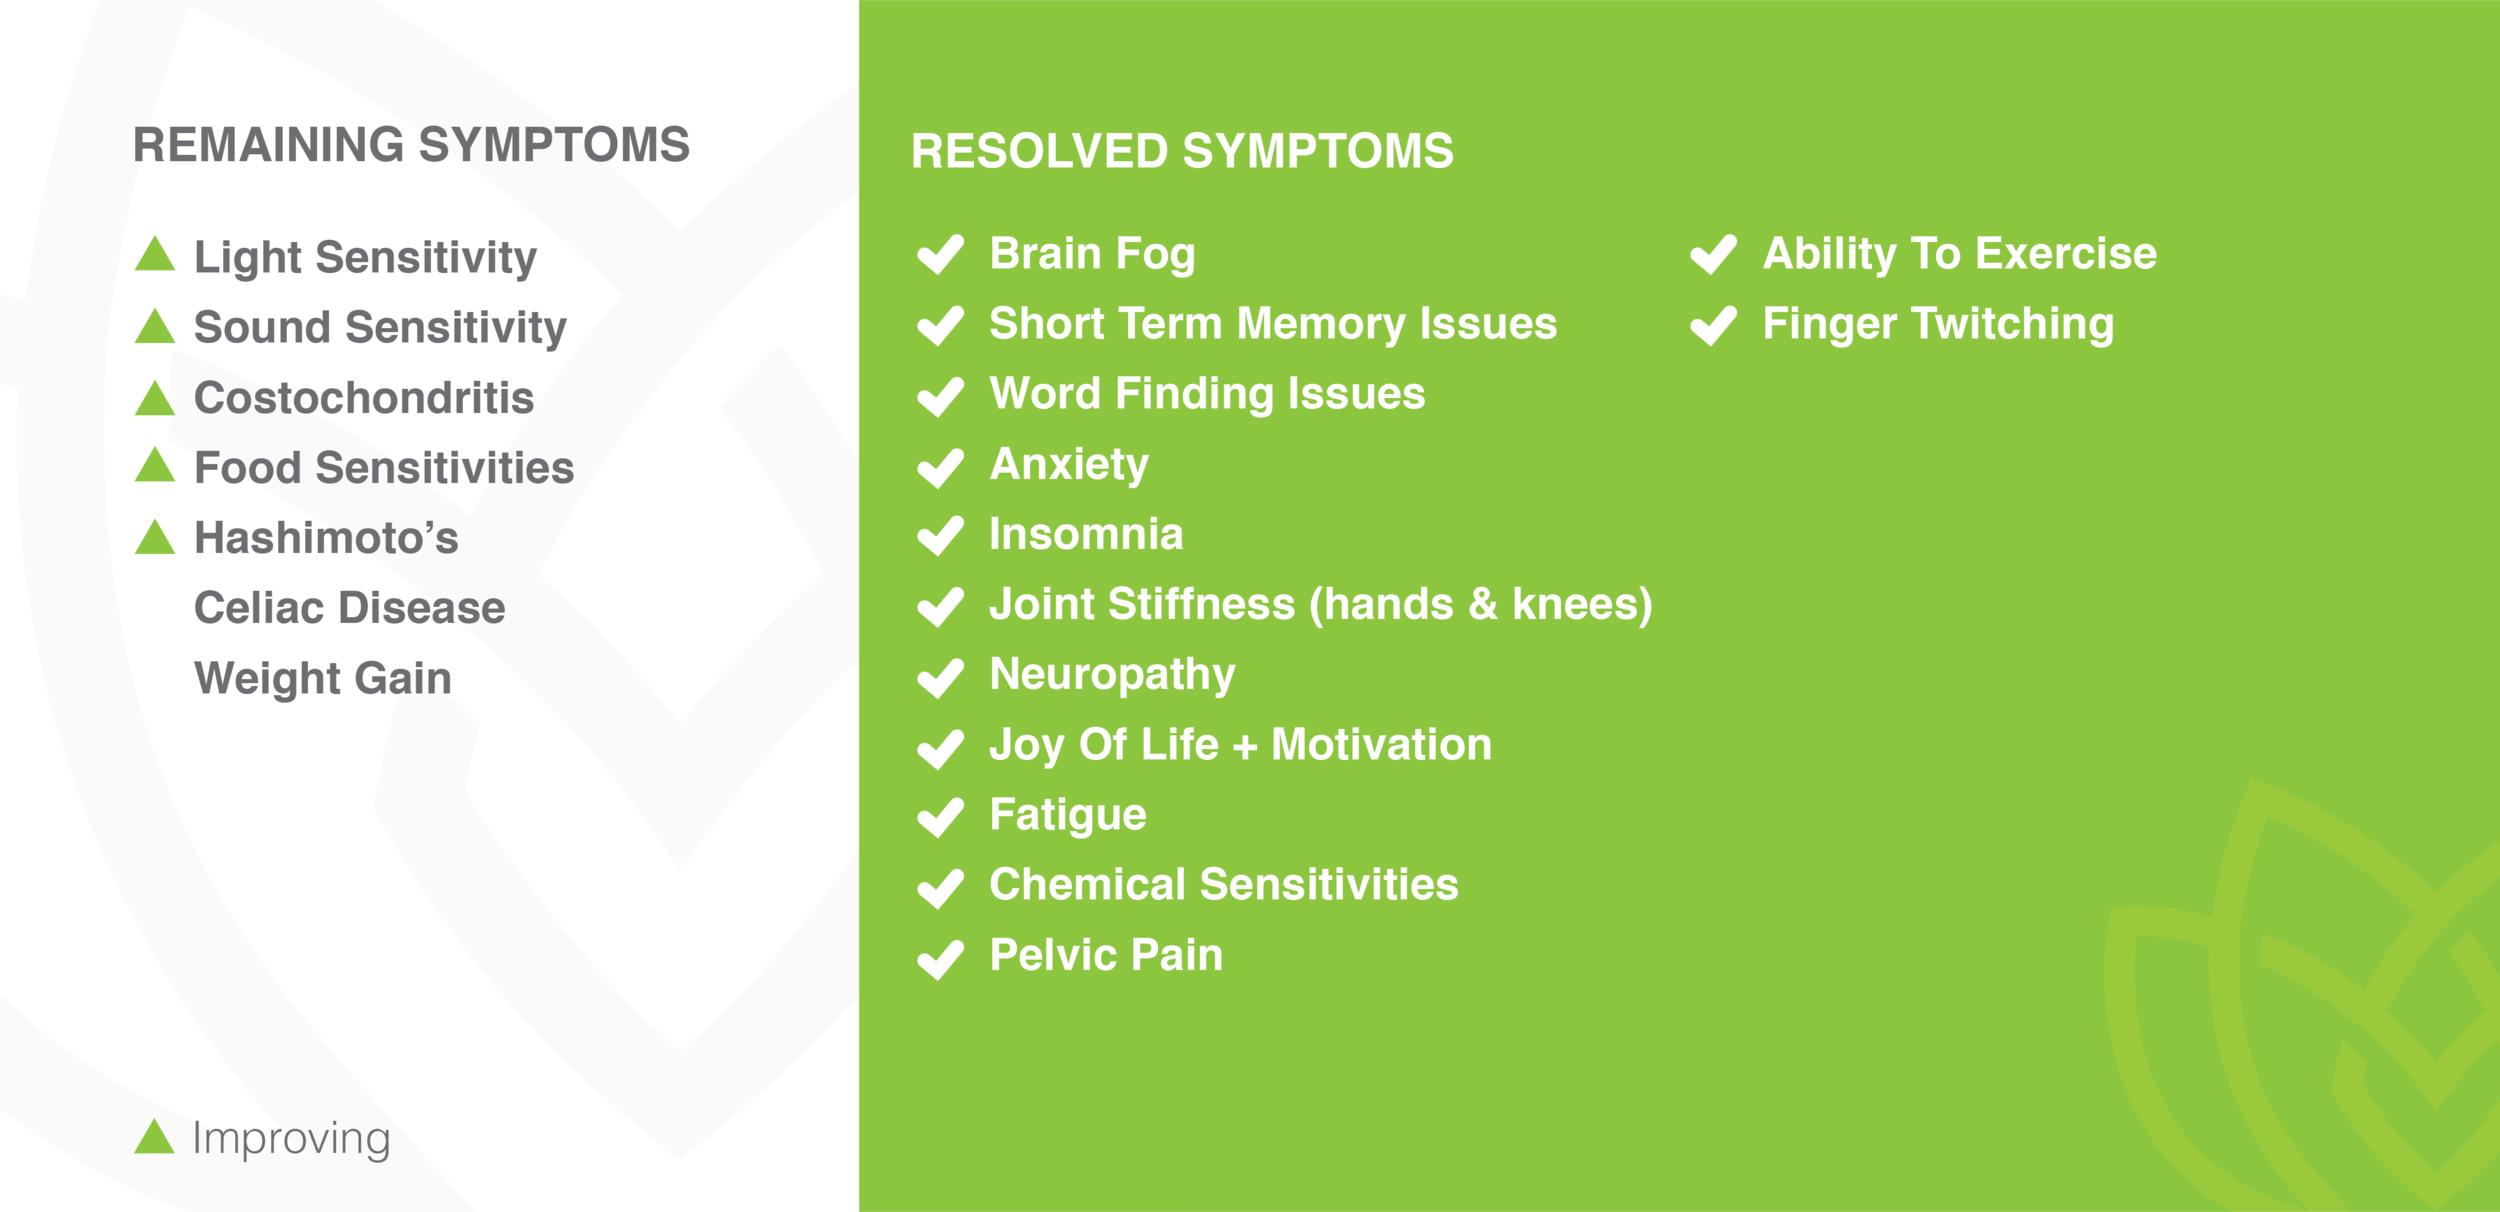 SymptomCheckList2-03.png